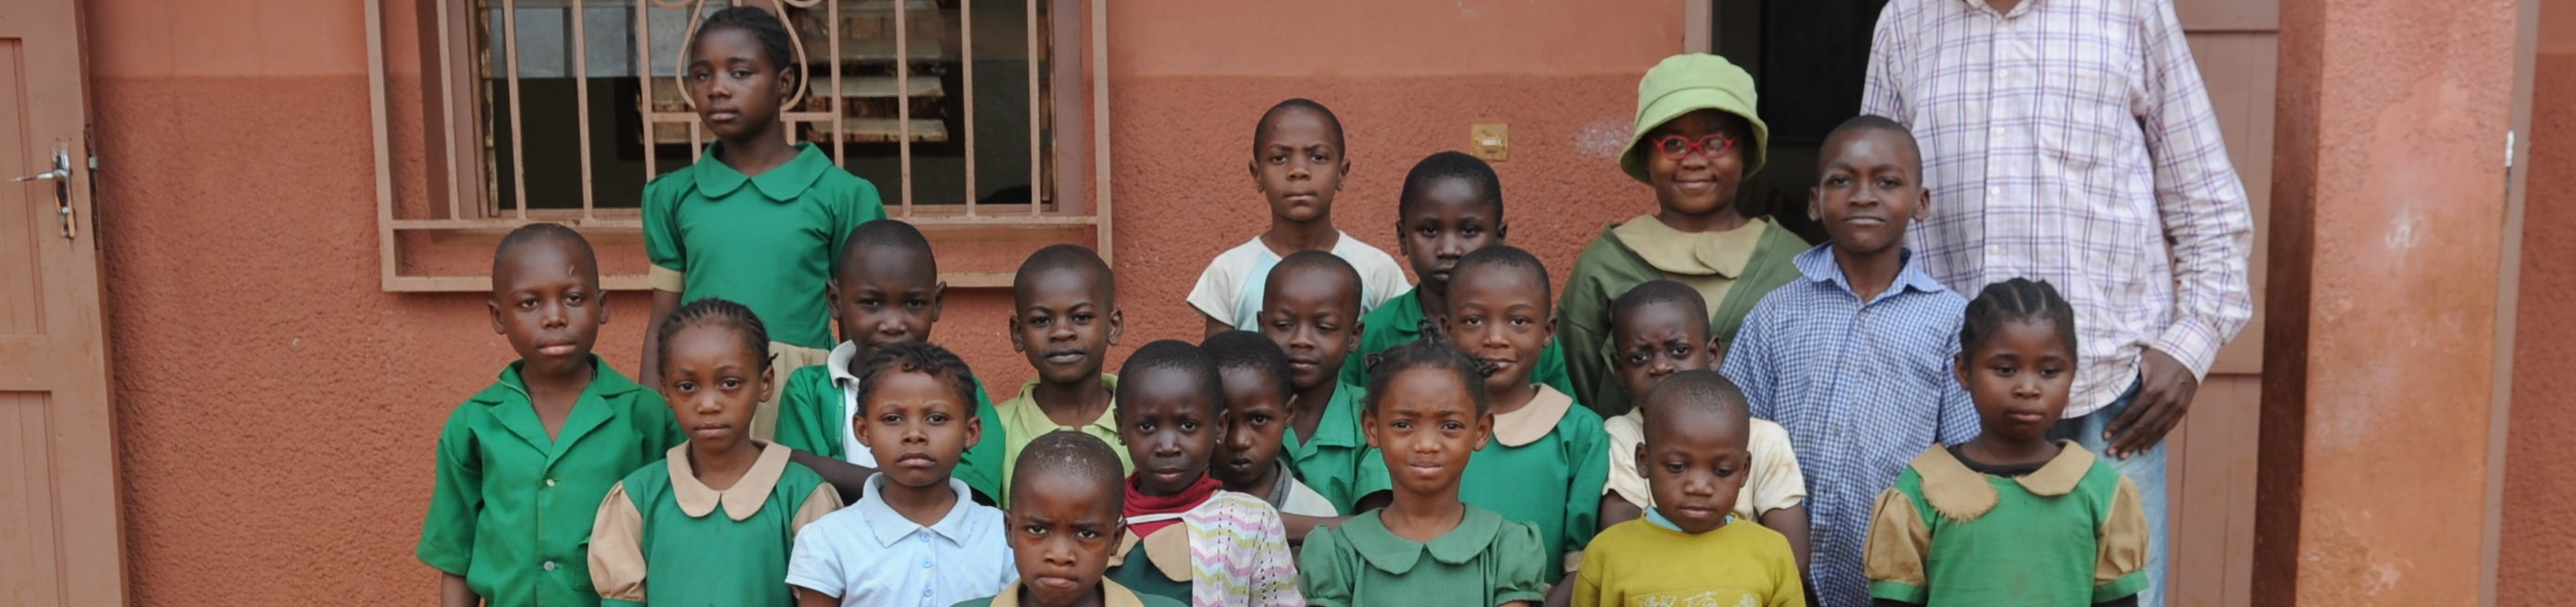 Blindenhilfe Kamerun